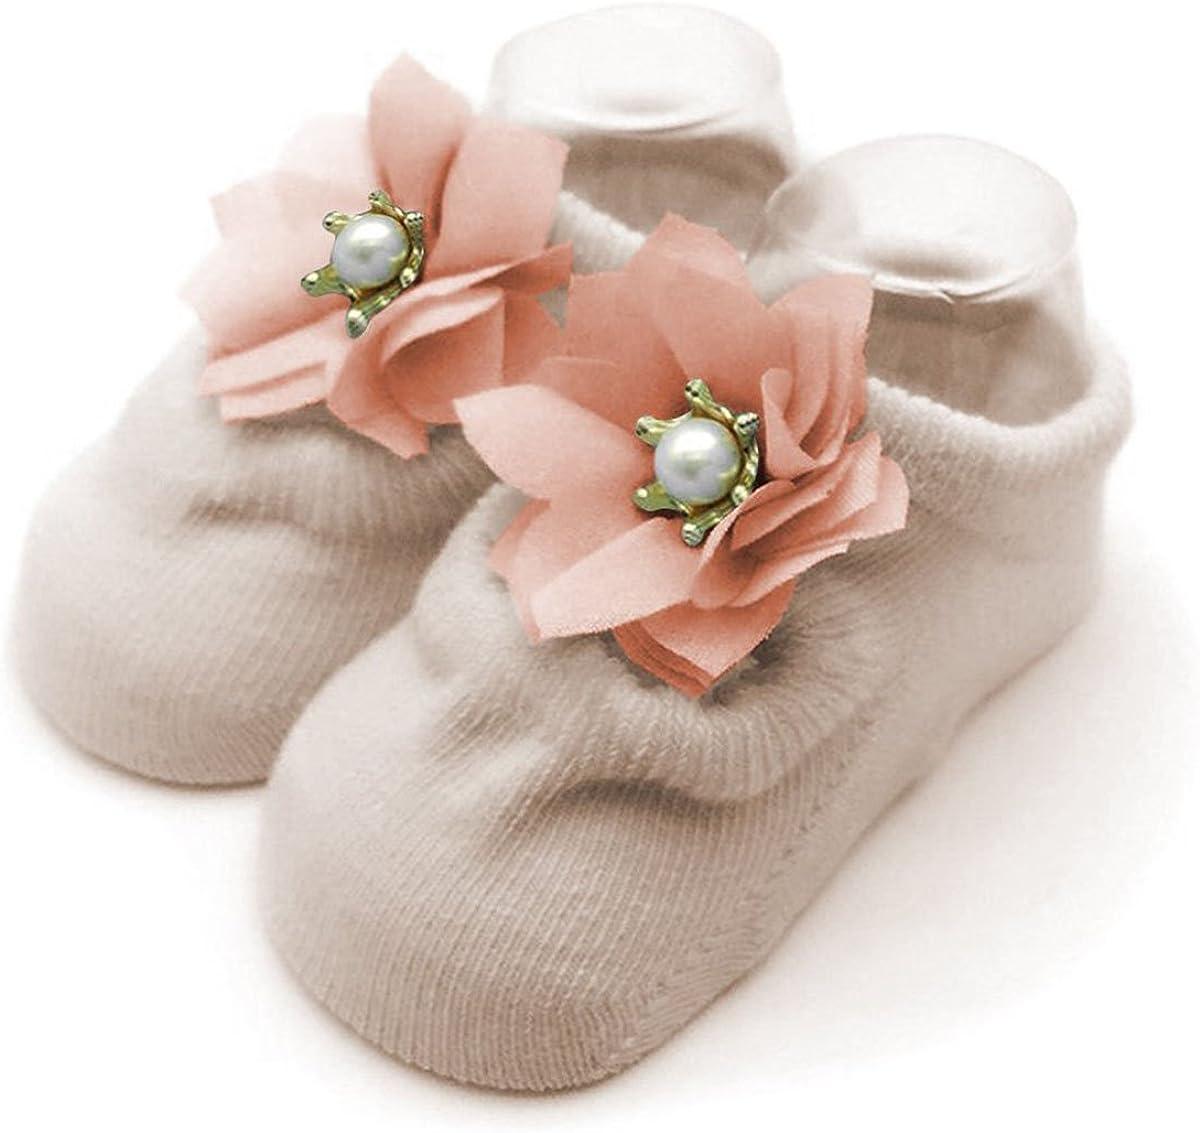 6Pairs Non-skid Baby Girls Lace Jane Socks Toddler Cotton Bowknot Walker Socks